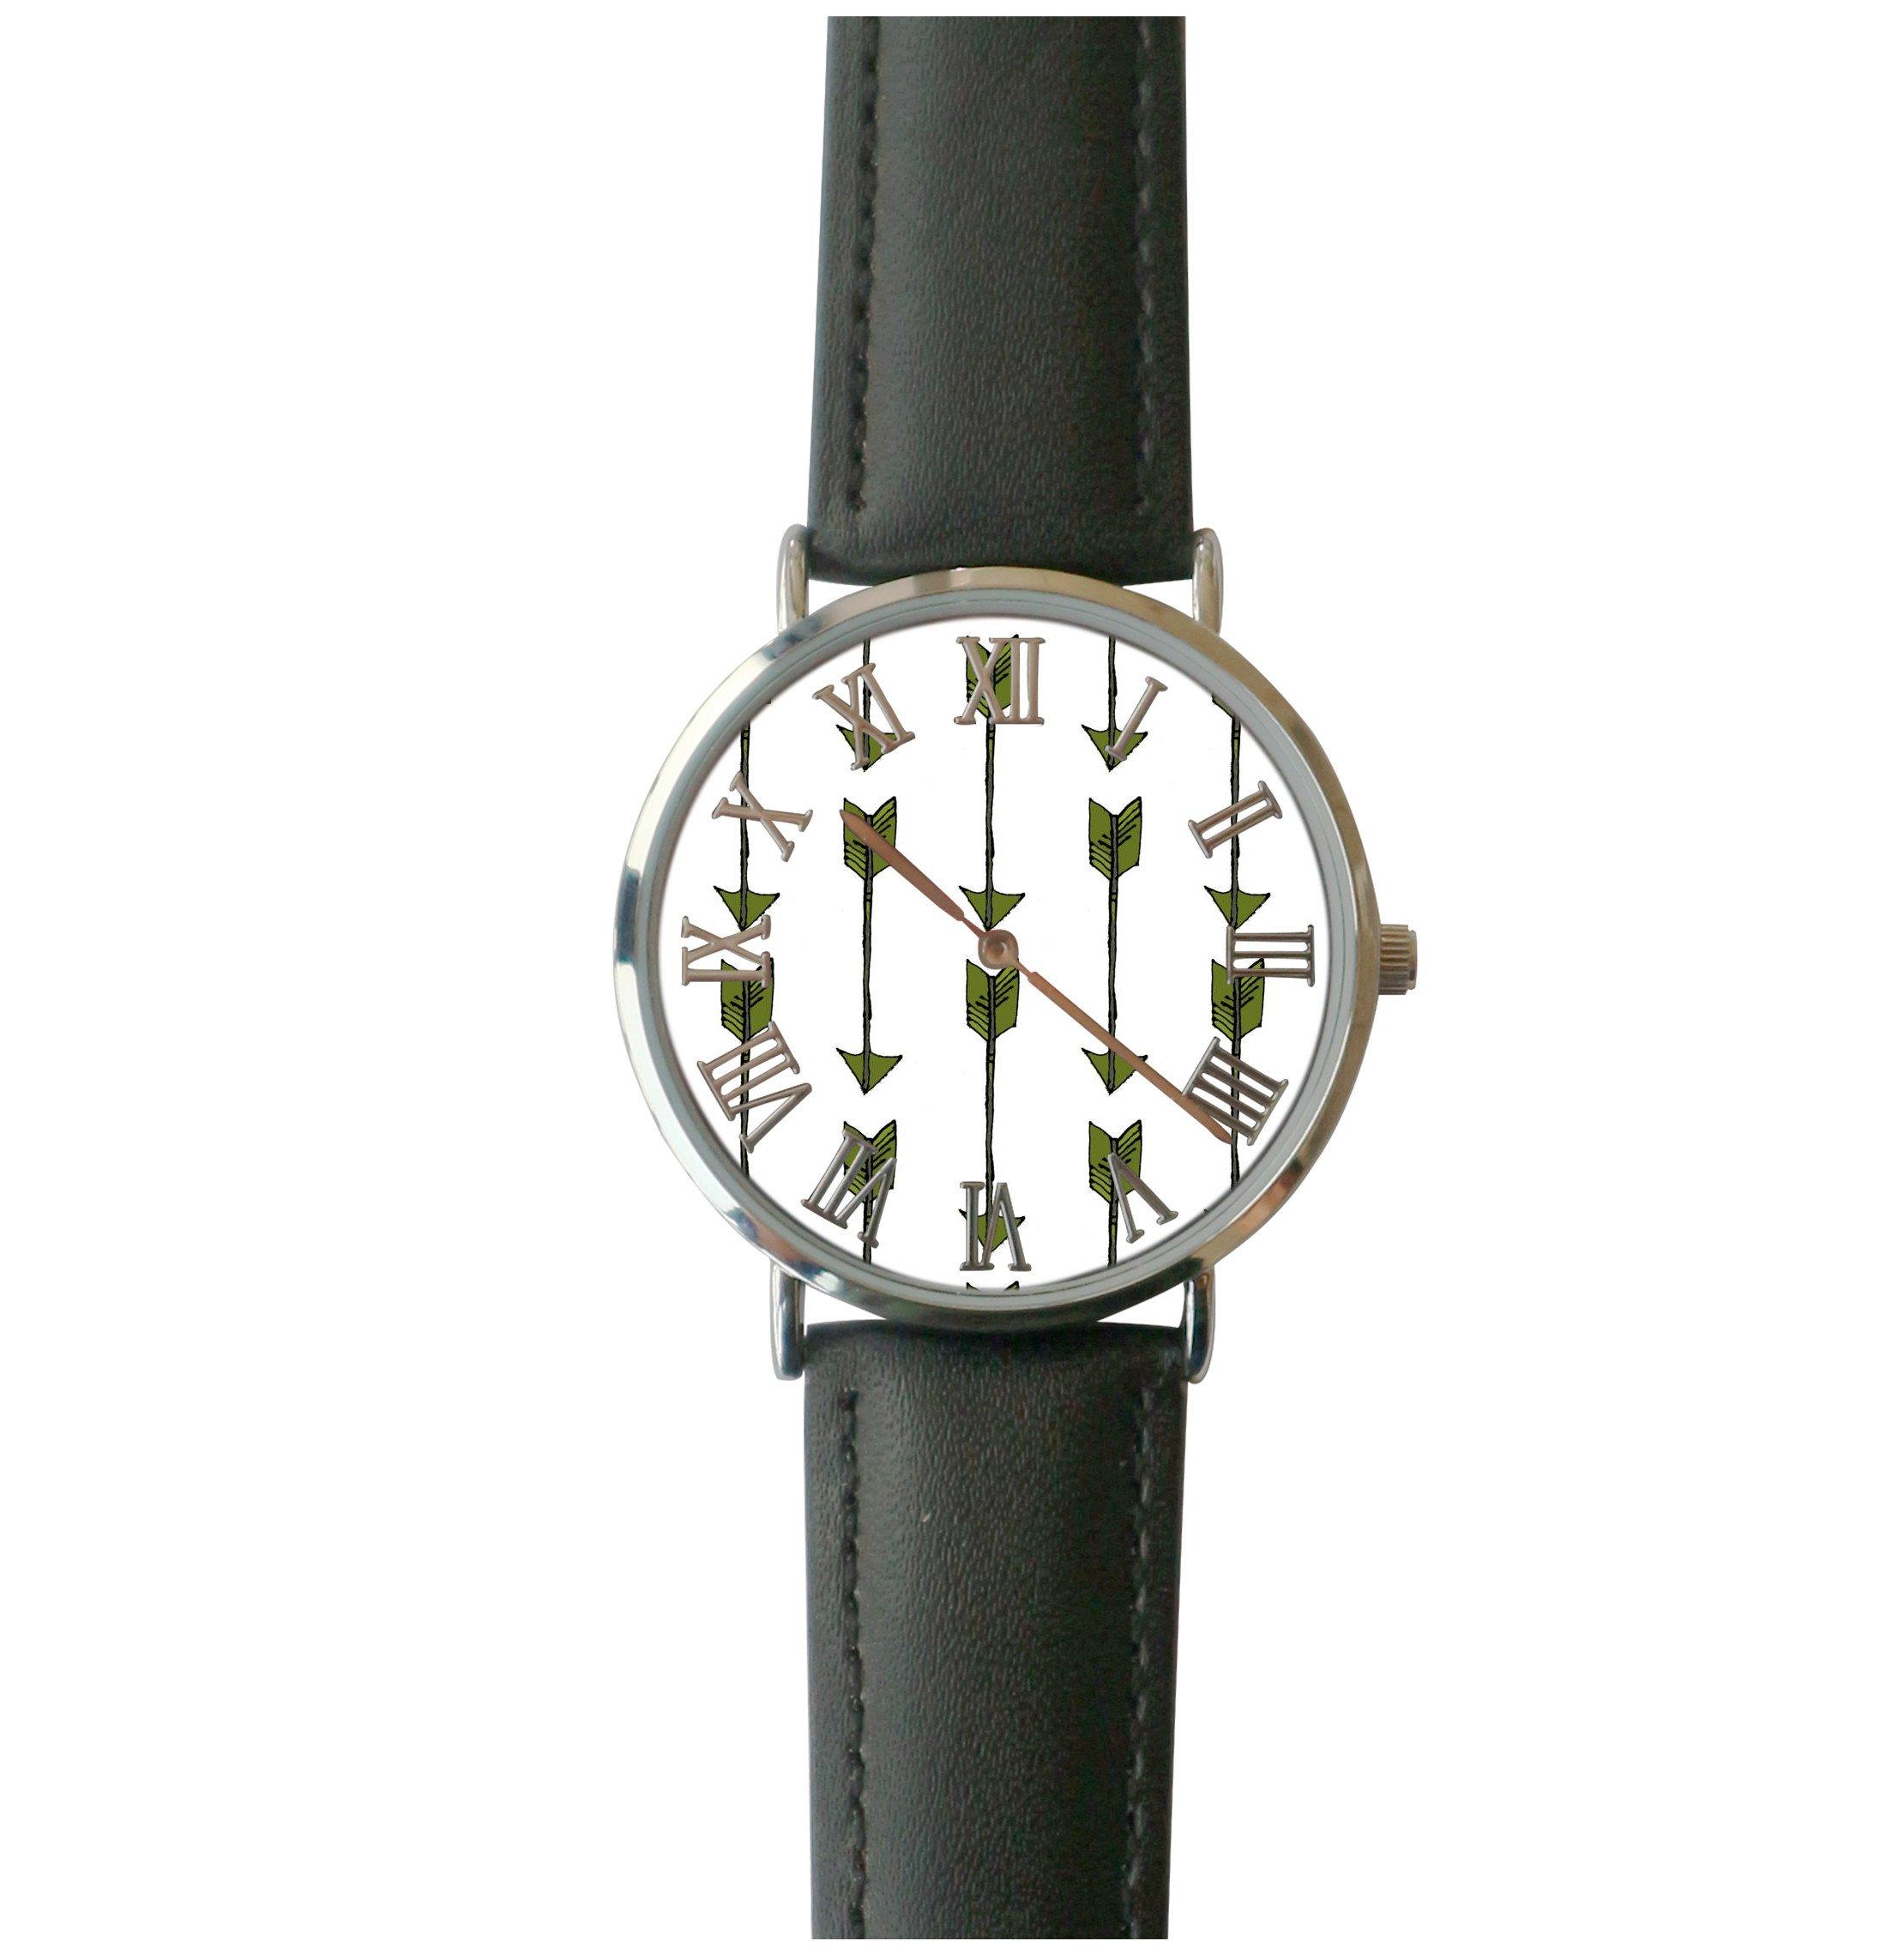 JISJJCKJSX Green Arrow custom watches quartz watch stainless steel case